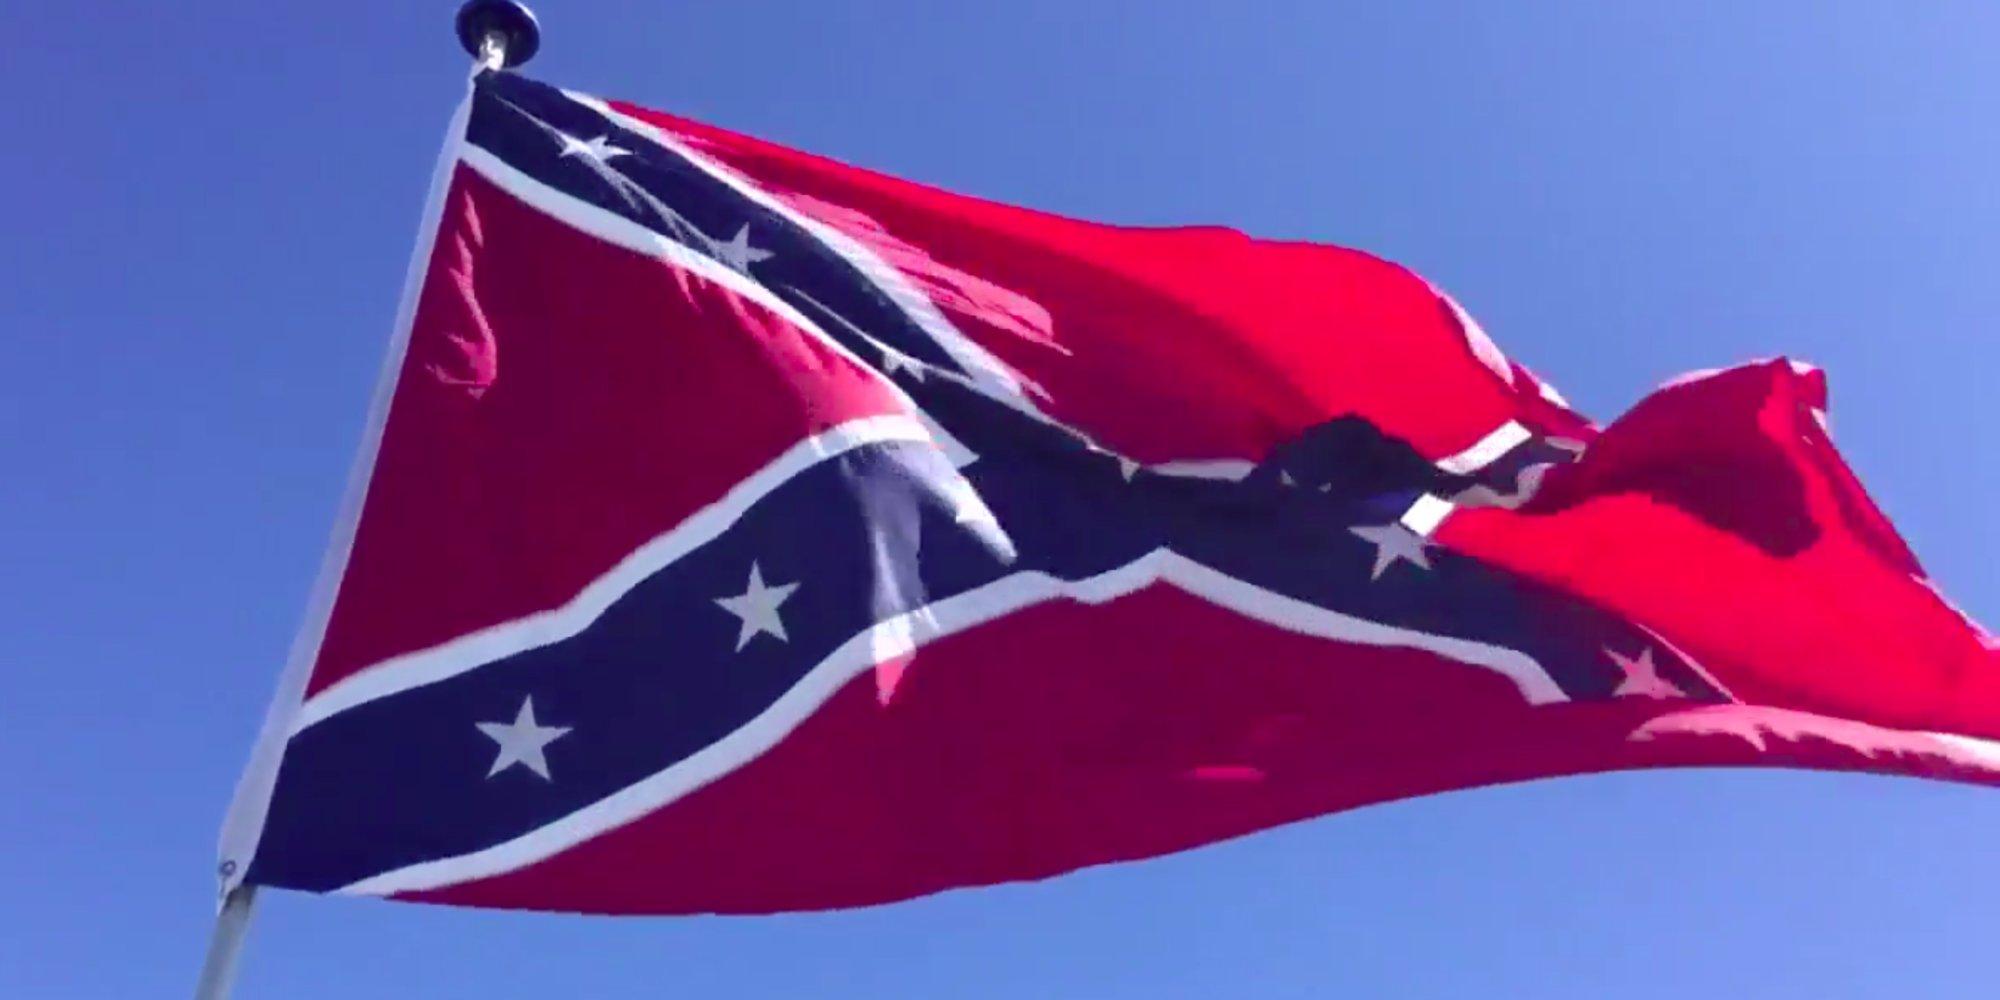 Confederate flag appears outside NCAA tournament in South Carolina https://t.co/iD5f3swqTs https://t.co/LGkAaJ2Q2h